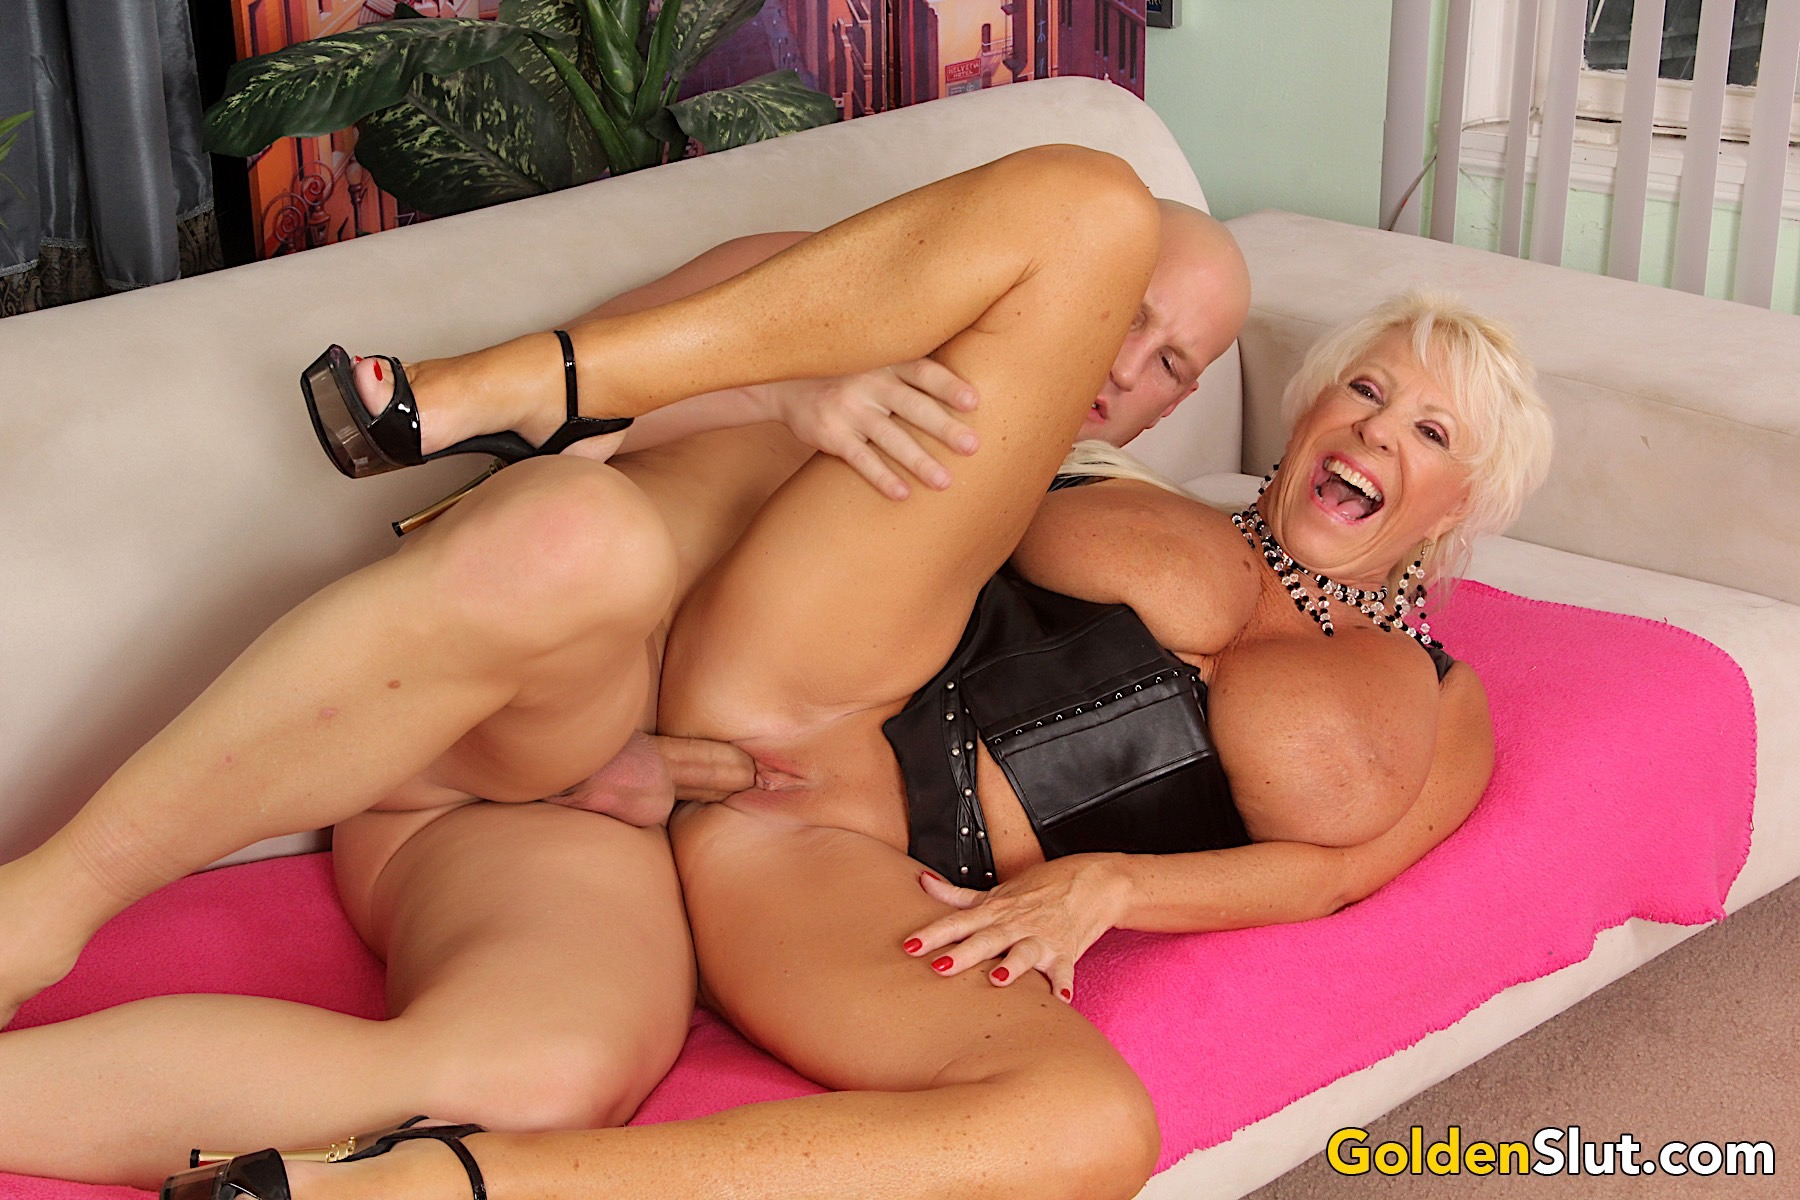 Russian Woman Having Sex